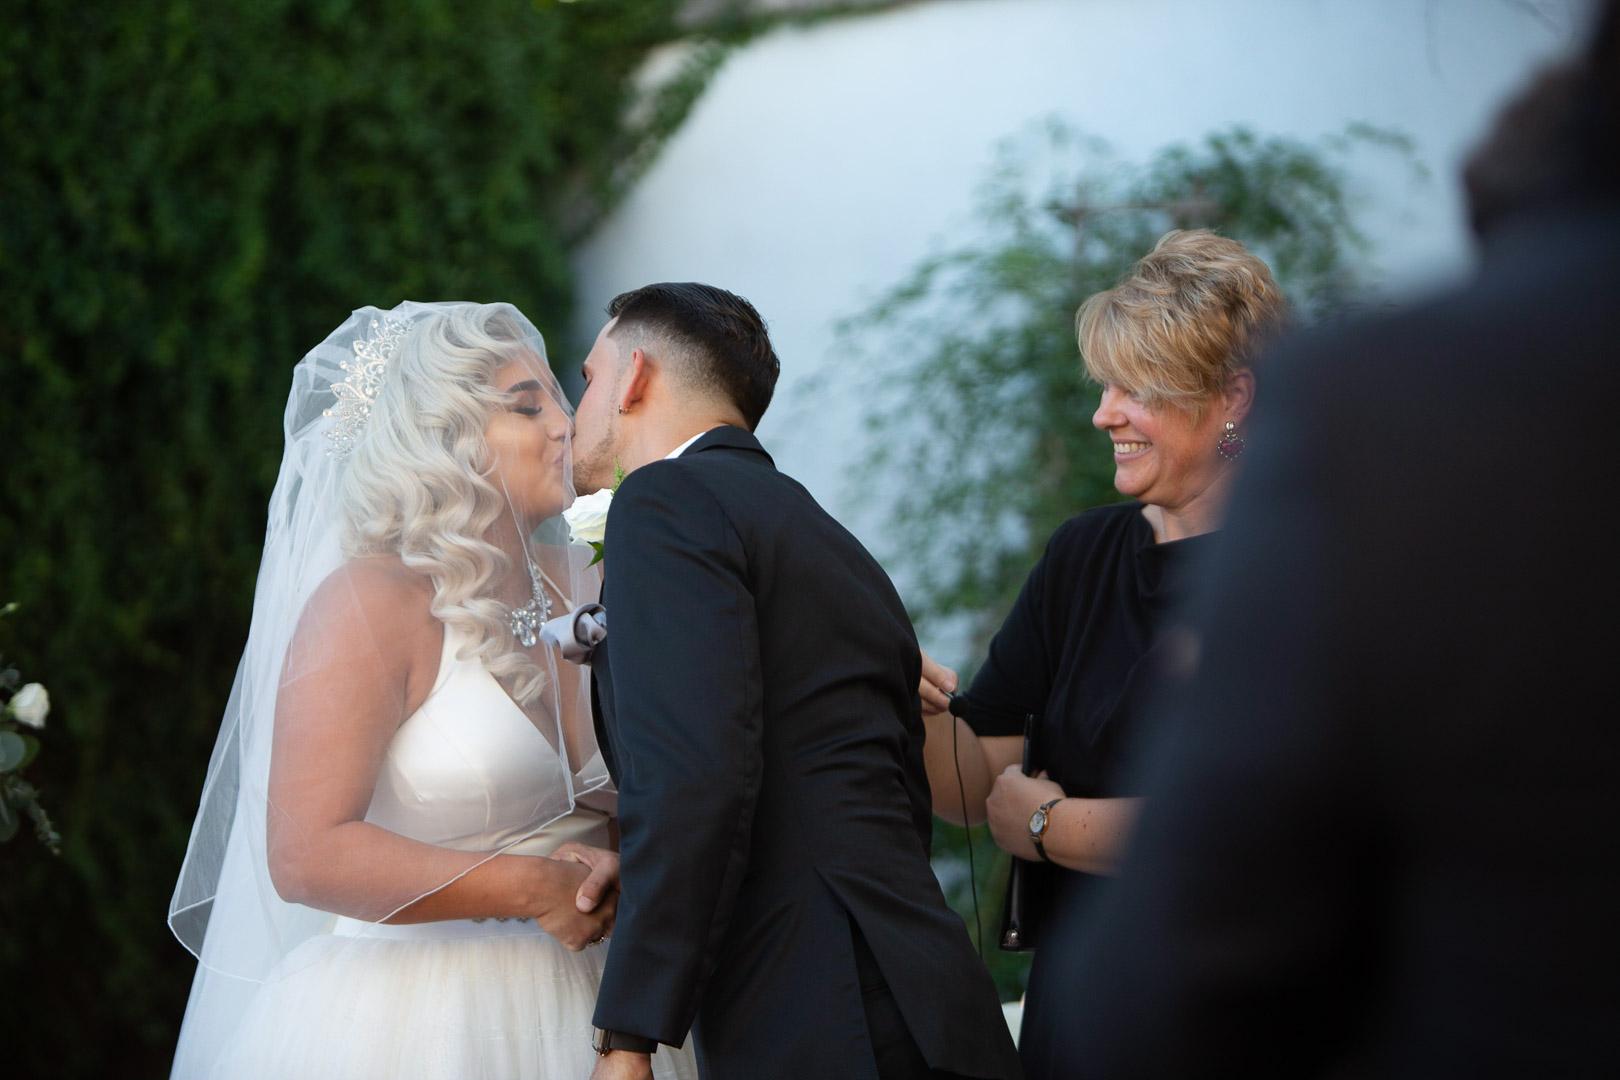 Weddings by Amy-4.jpg